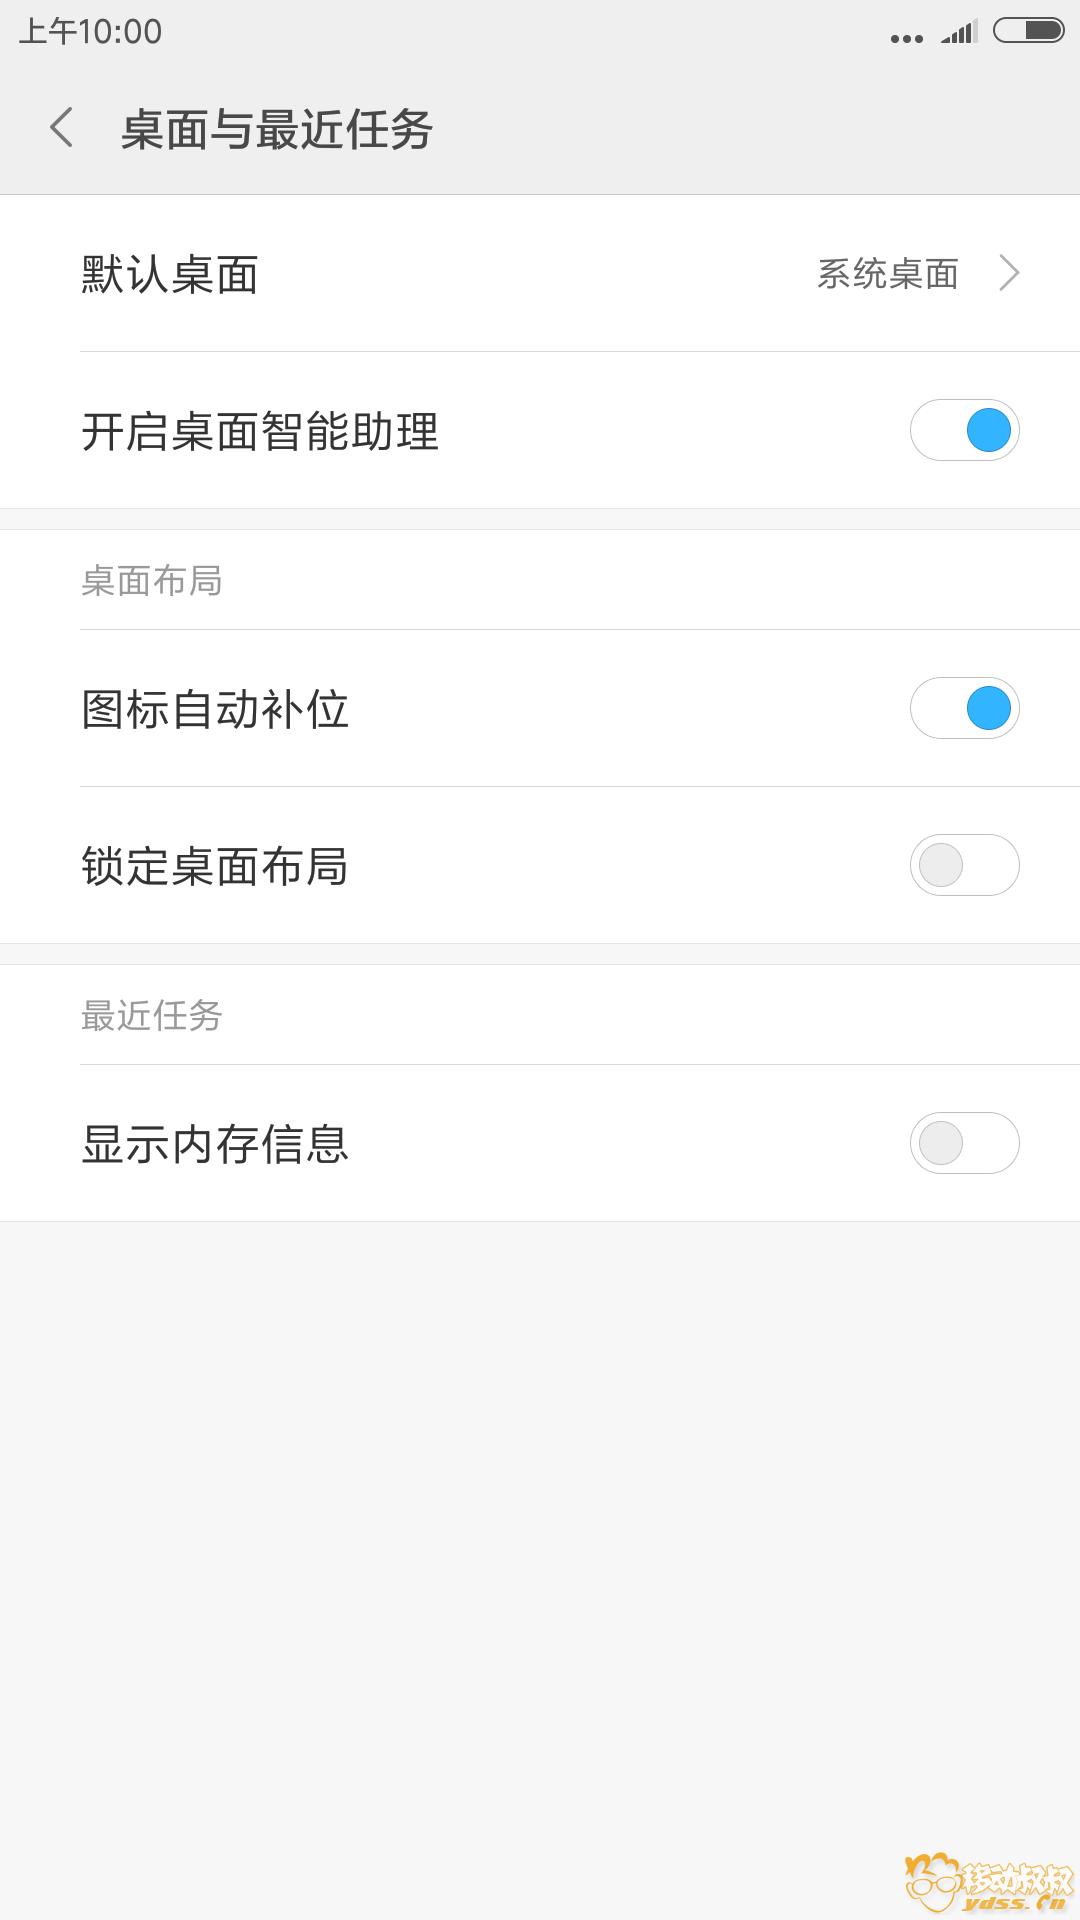 Screenshot_2017-05-17-10-00-54-536_com.android.settings.png